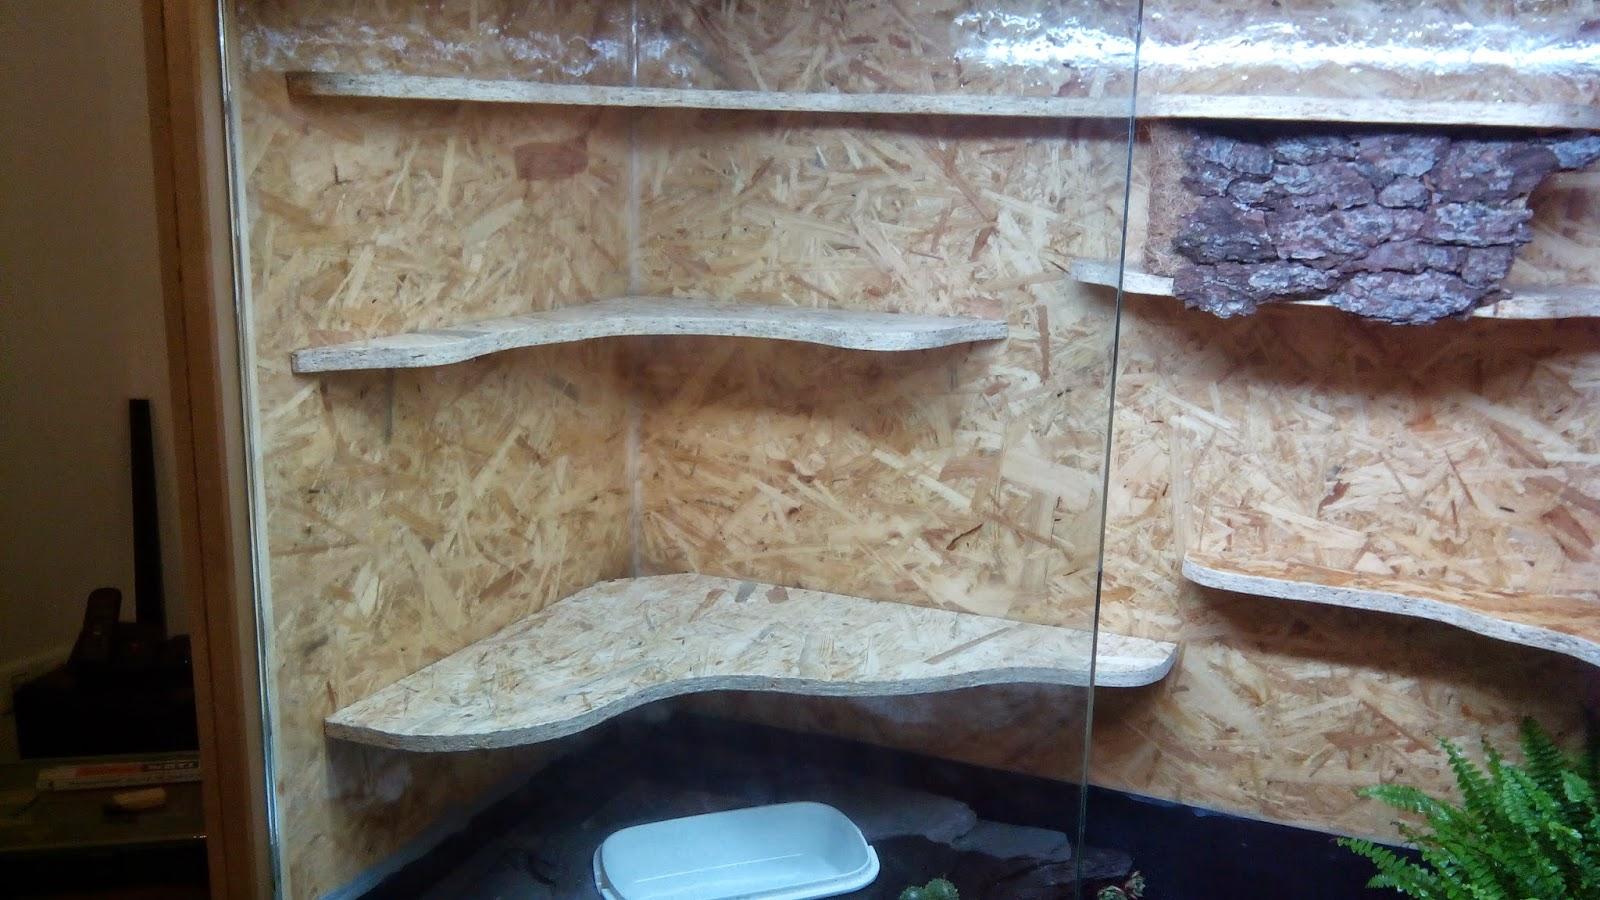 meinblog osb terrarium f r kornnatter bau dokumentation. Black Bedroom Furniture Sets. Home Design Ideas